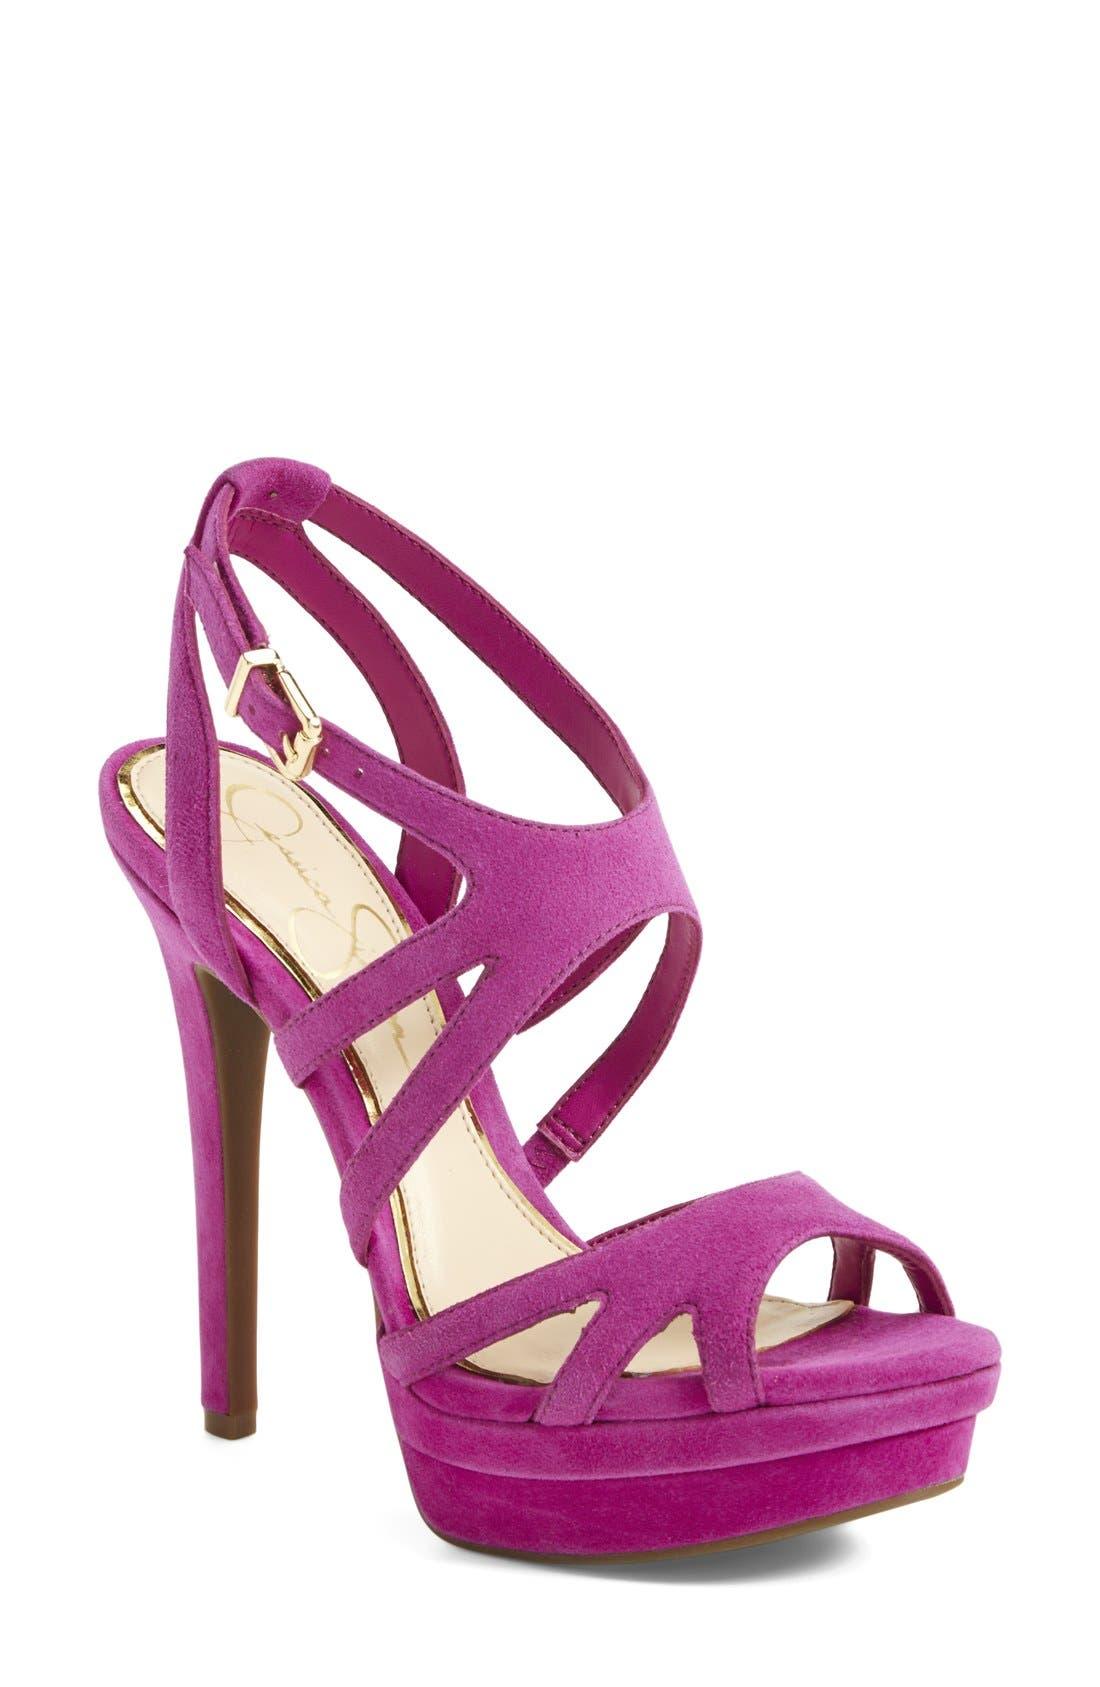 Main Image - Jessica Simpson 'Presslie' Ankle Strap Platform Sandal (Women)